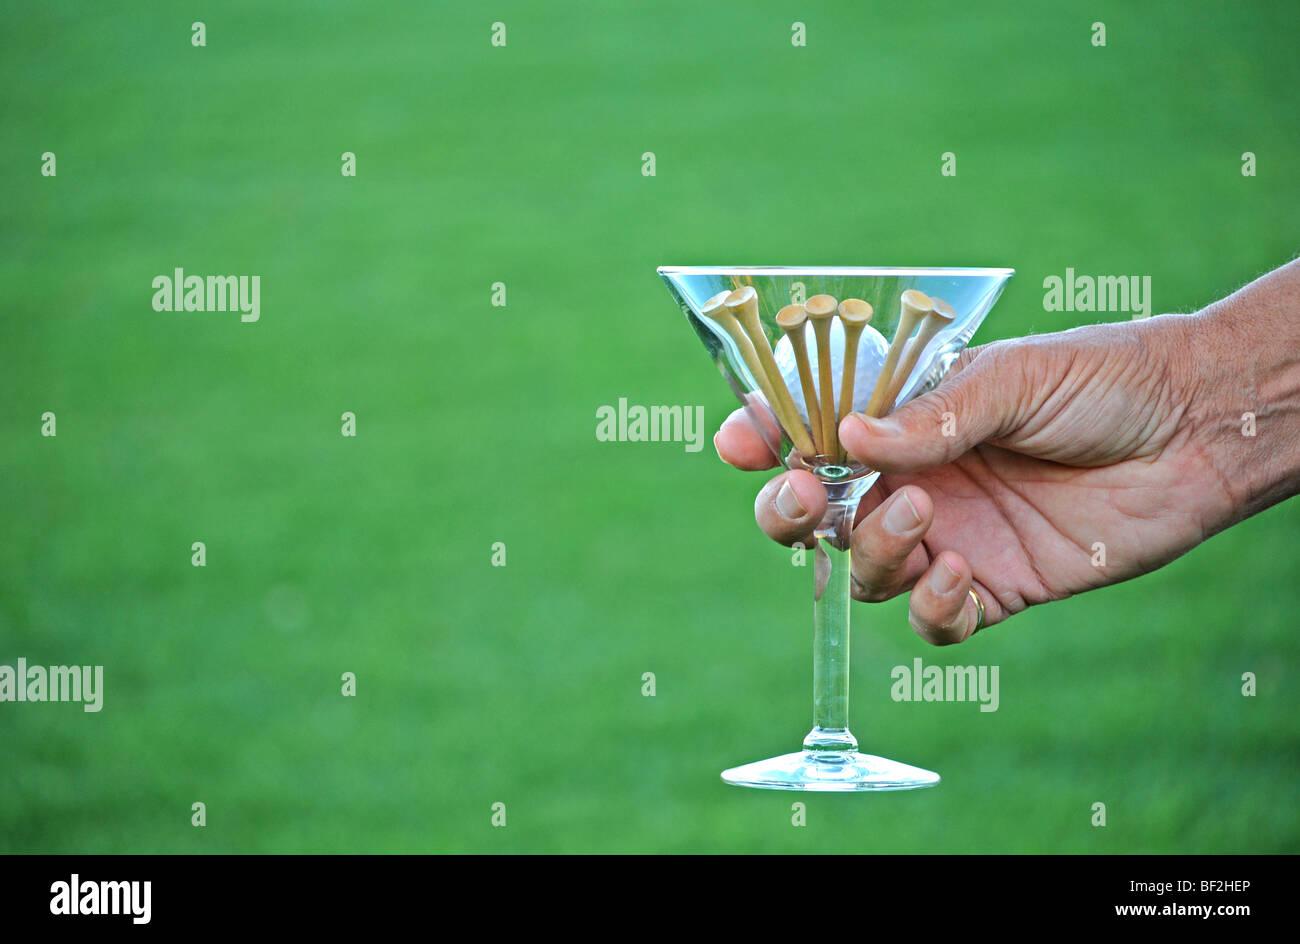 Hand Holding Martini Glass Stock Photos & Hand Holding Martini Glass ...